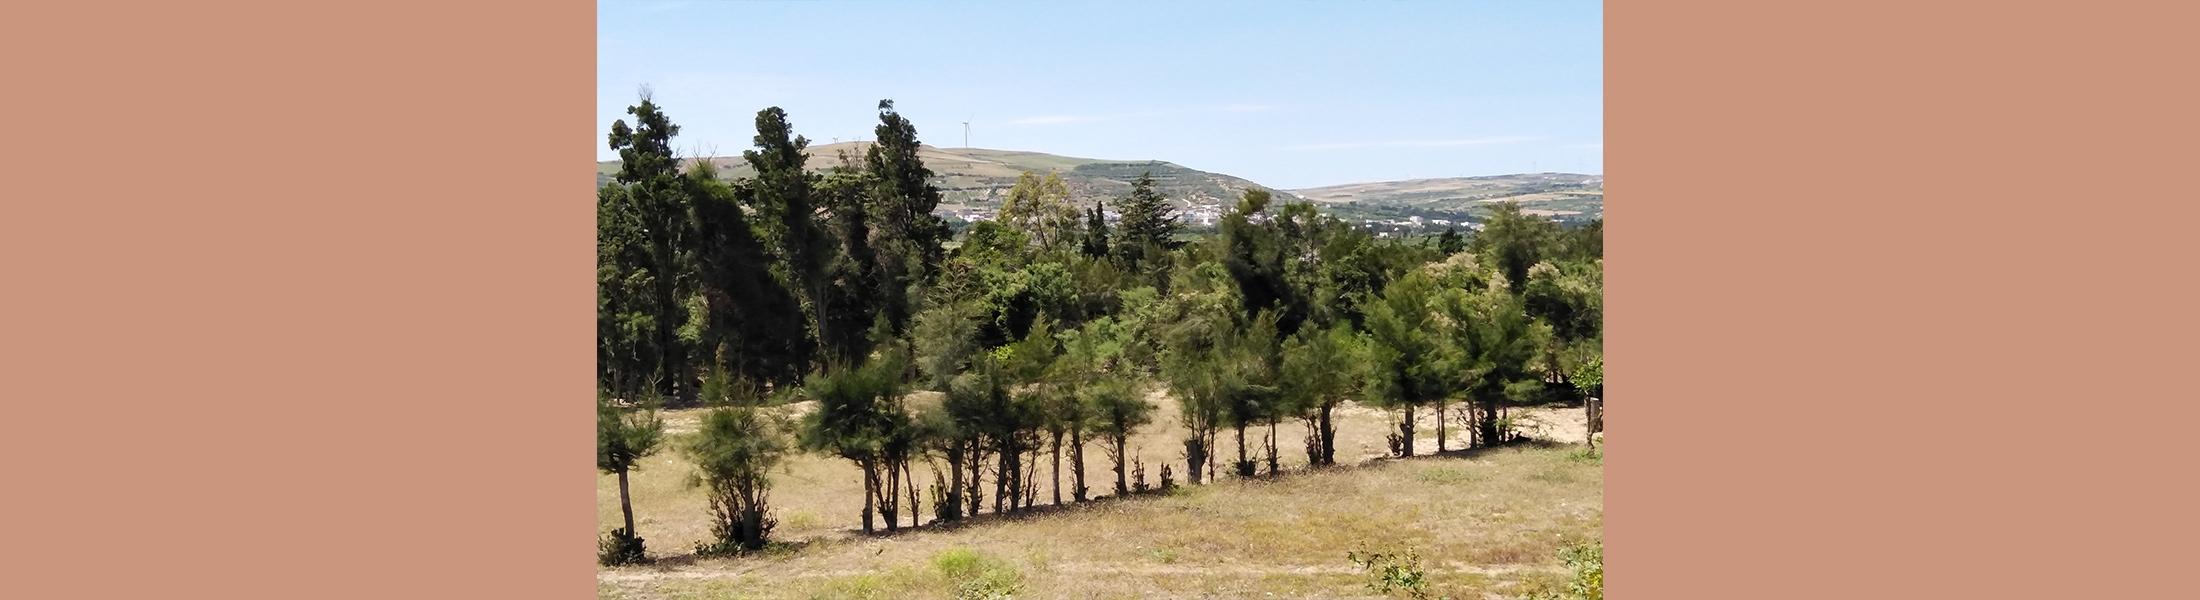 Terrain Ras Djebel 1 - Bizerte (Appel d'Offres N° 08/2020)